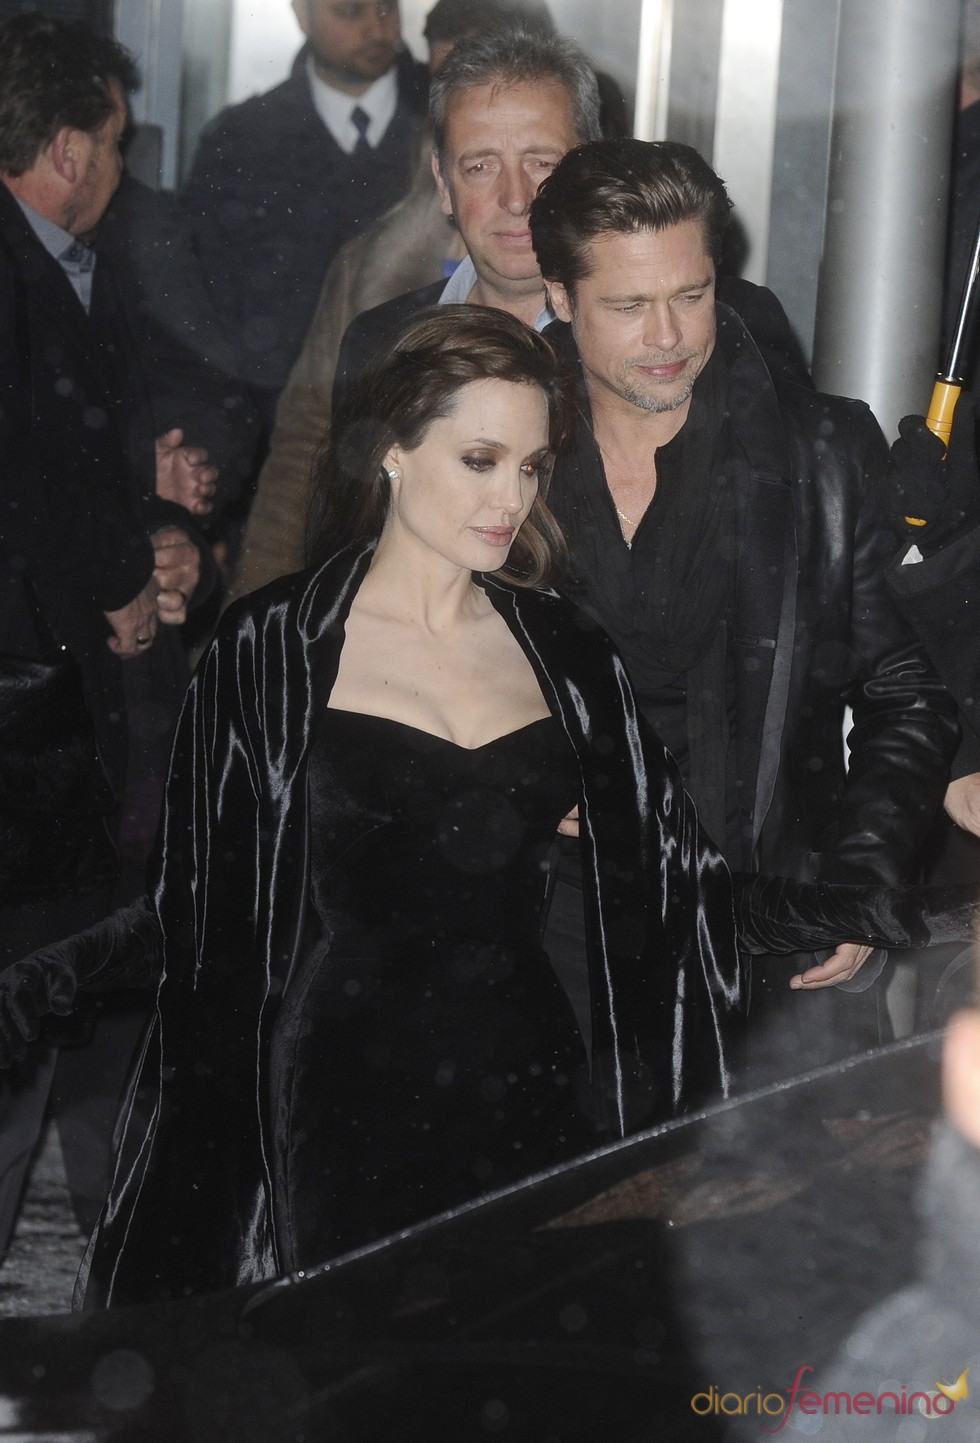 Brad Pitt y Angelina Jolie al finalizar la premier de 'The Tourist'